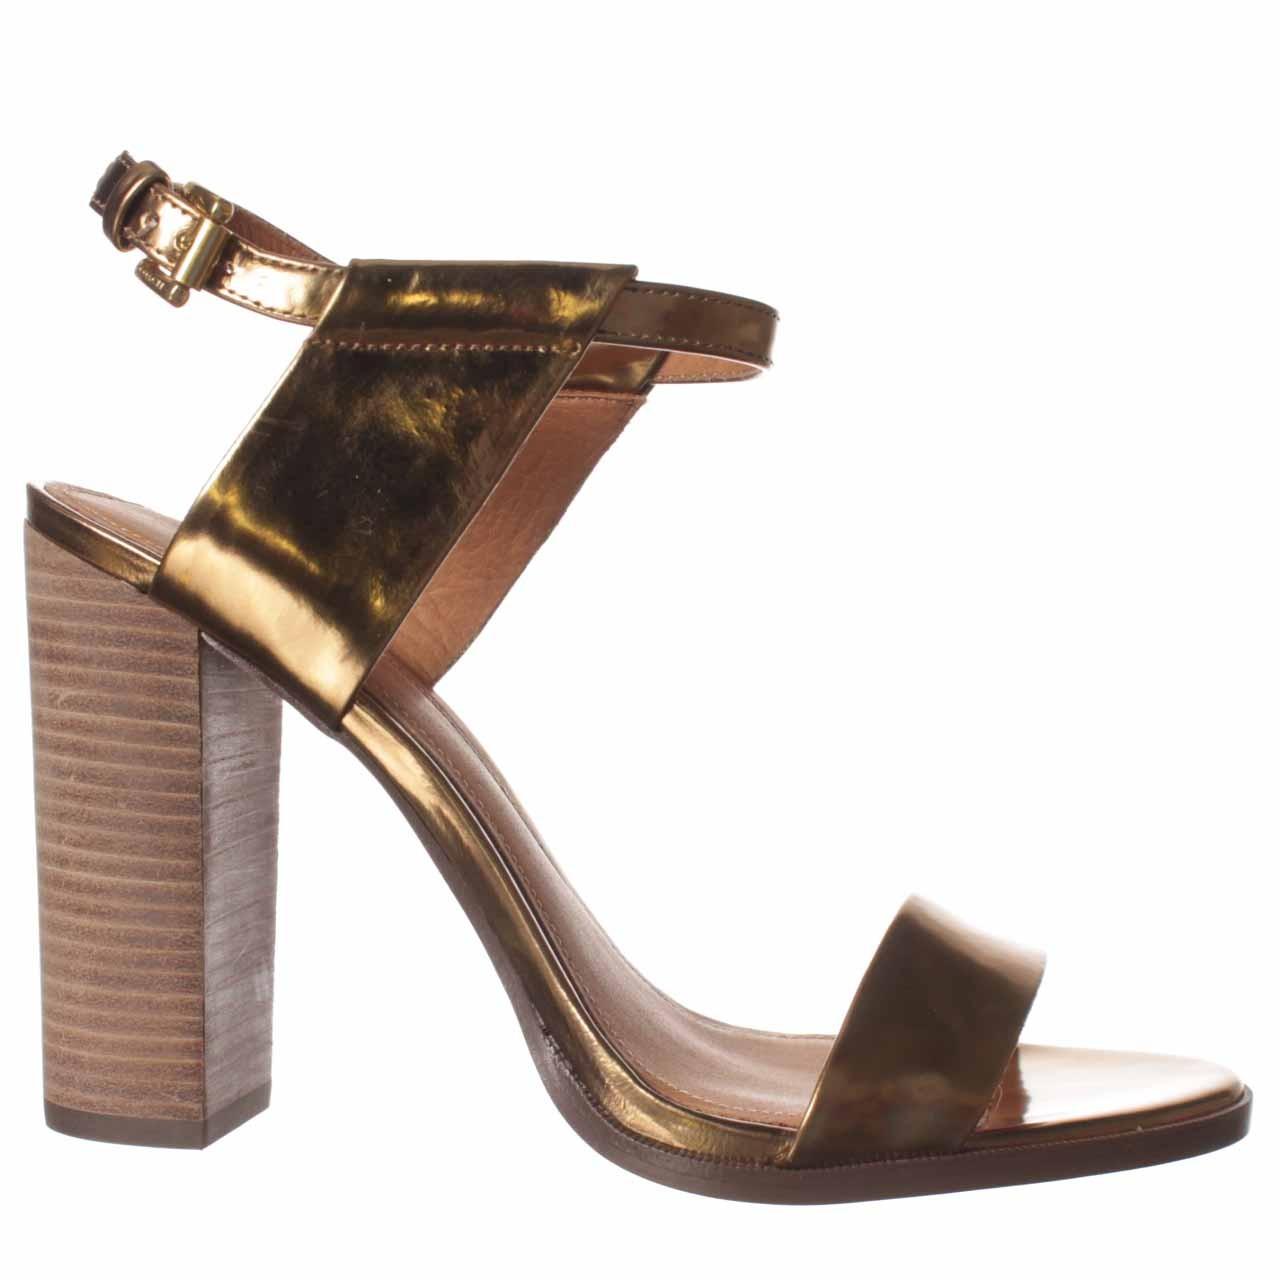 Lyst - Coach Lexey Slingback Sandal in Metallic